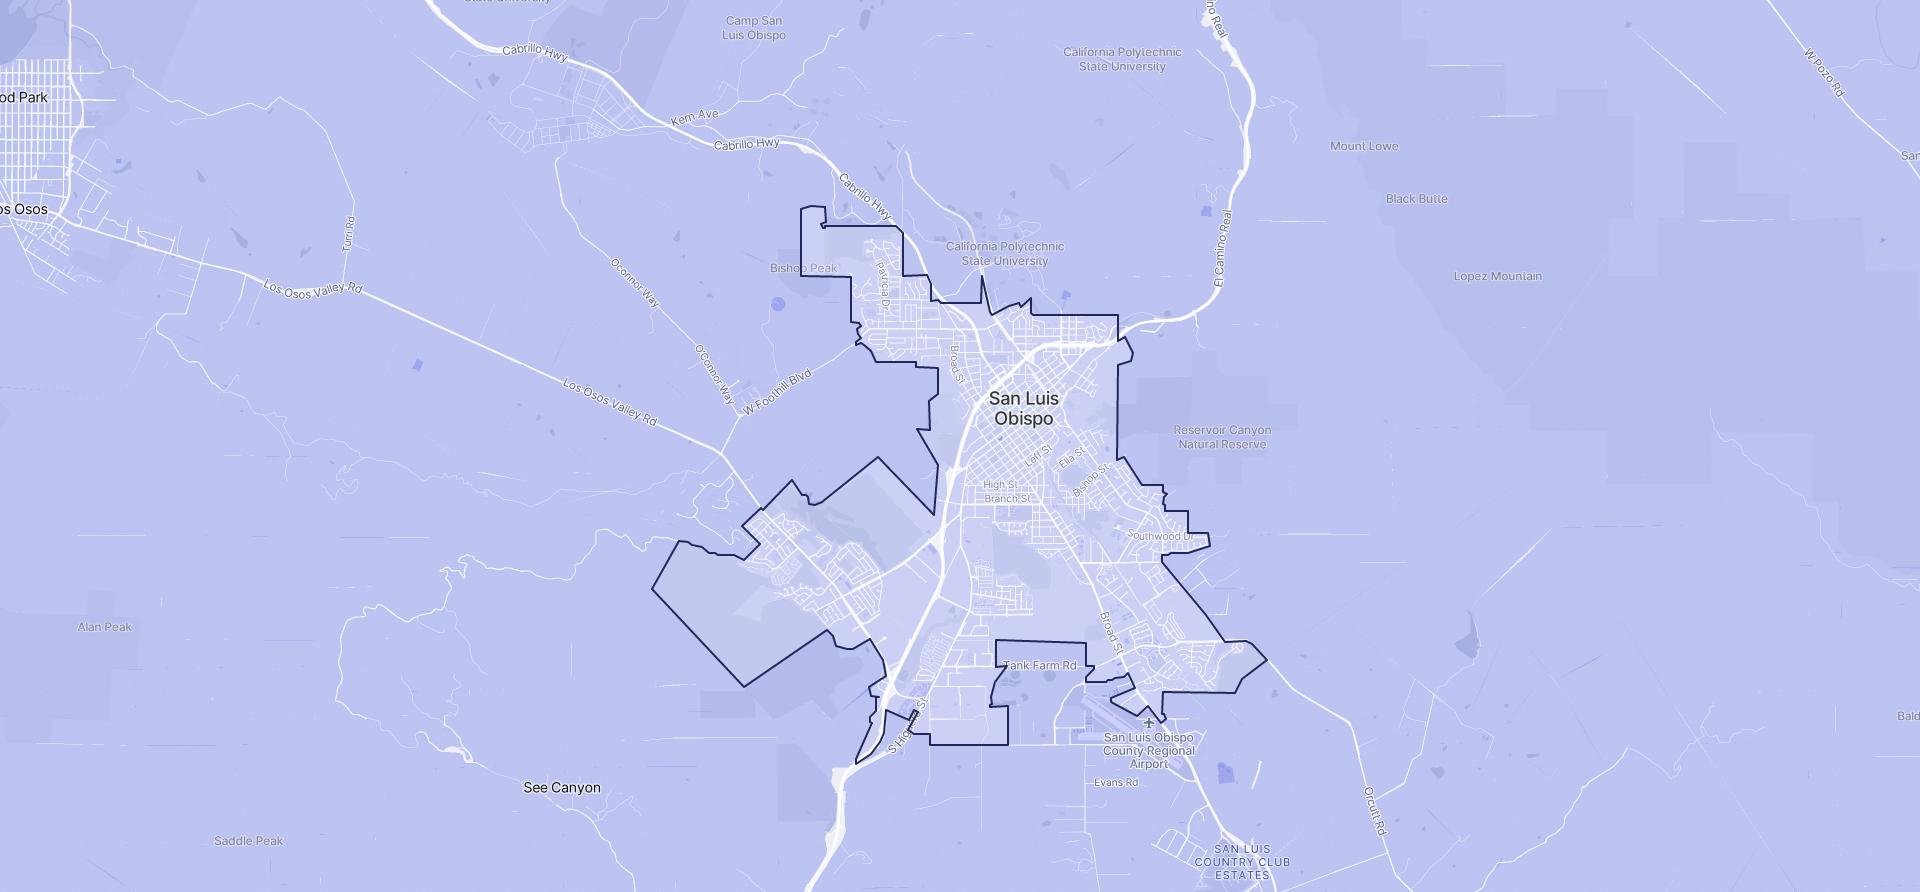 Image of San Luis Obispo boundaries on a map.